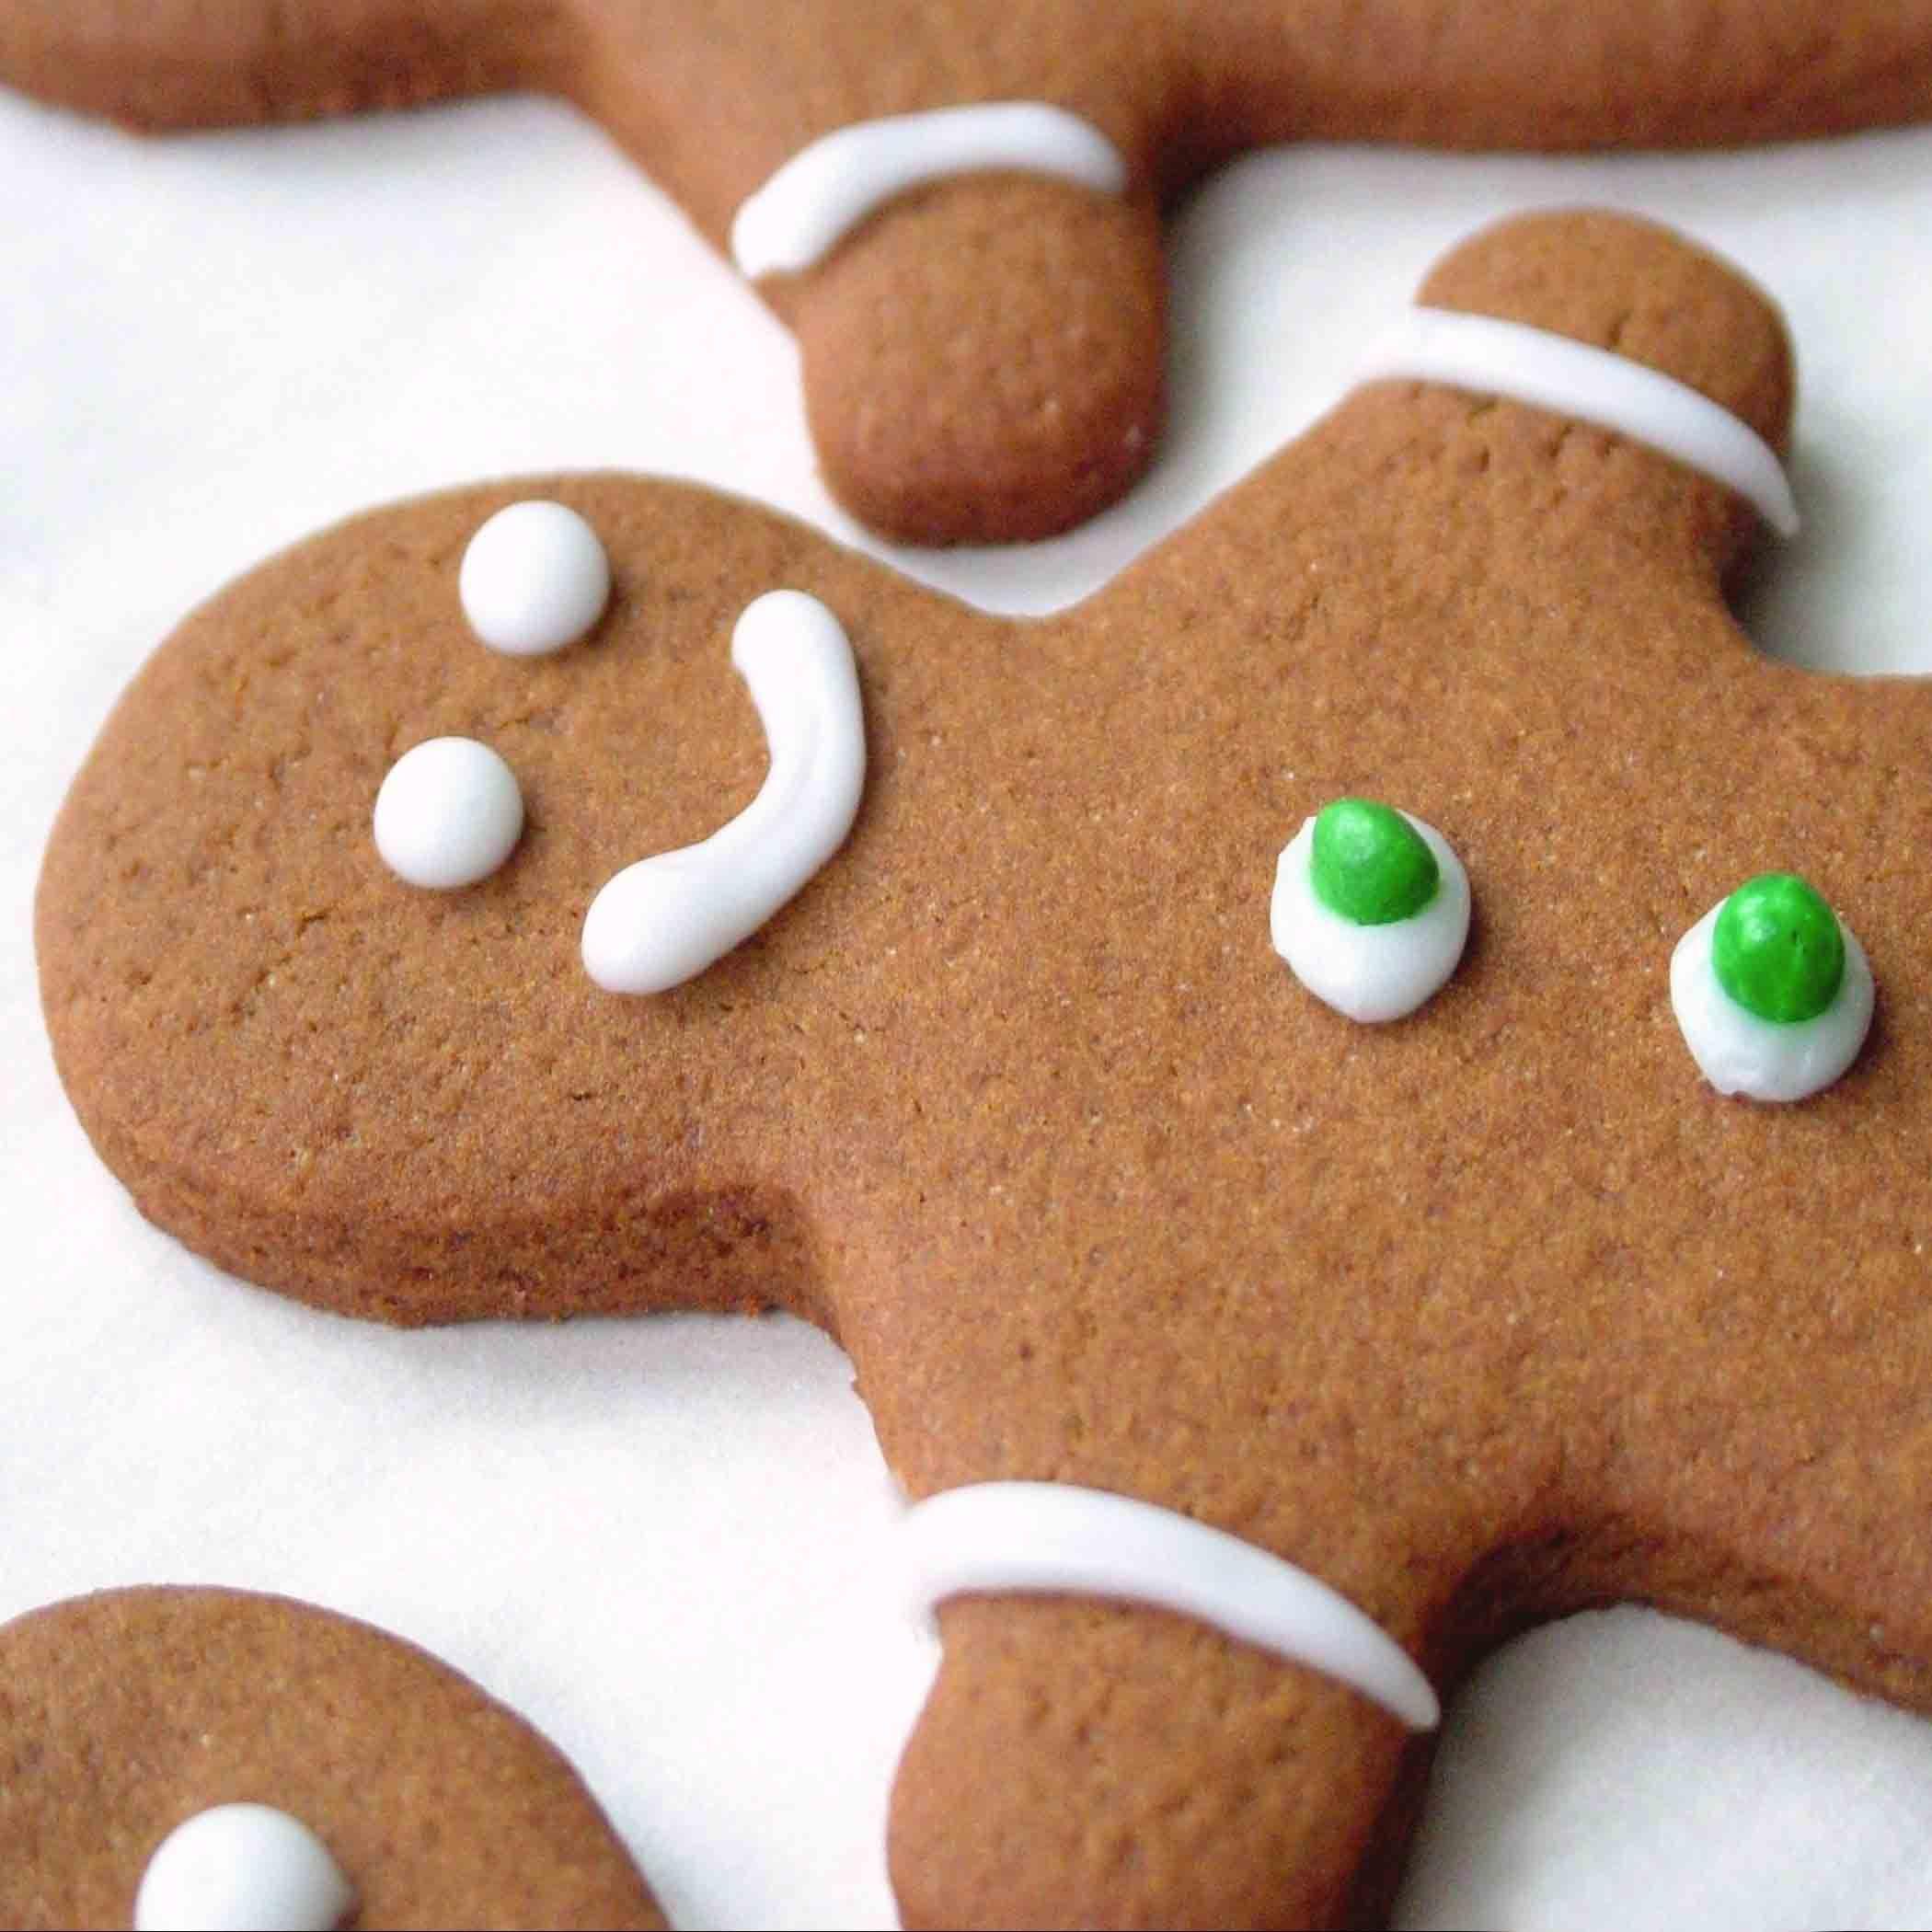 Low fat gingerbread men recipe | Gingerbread, Gingerbread ...